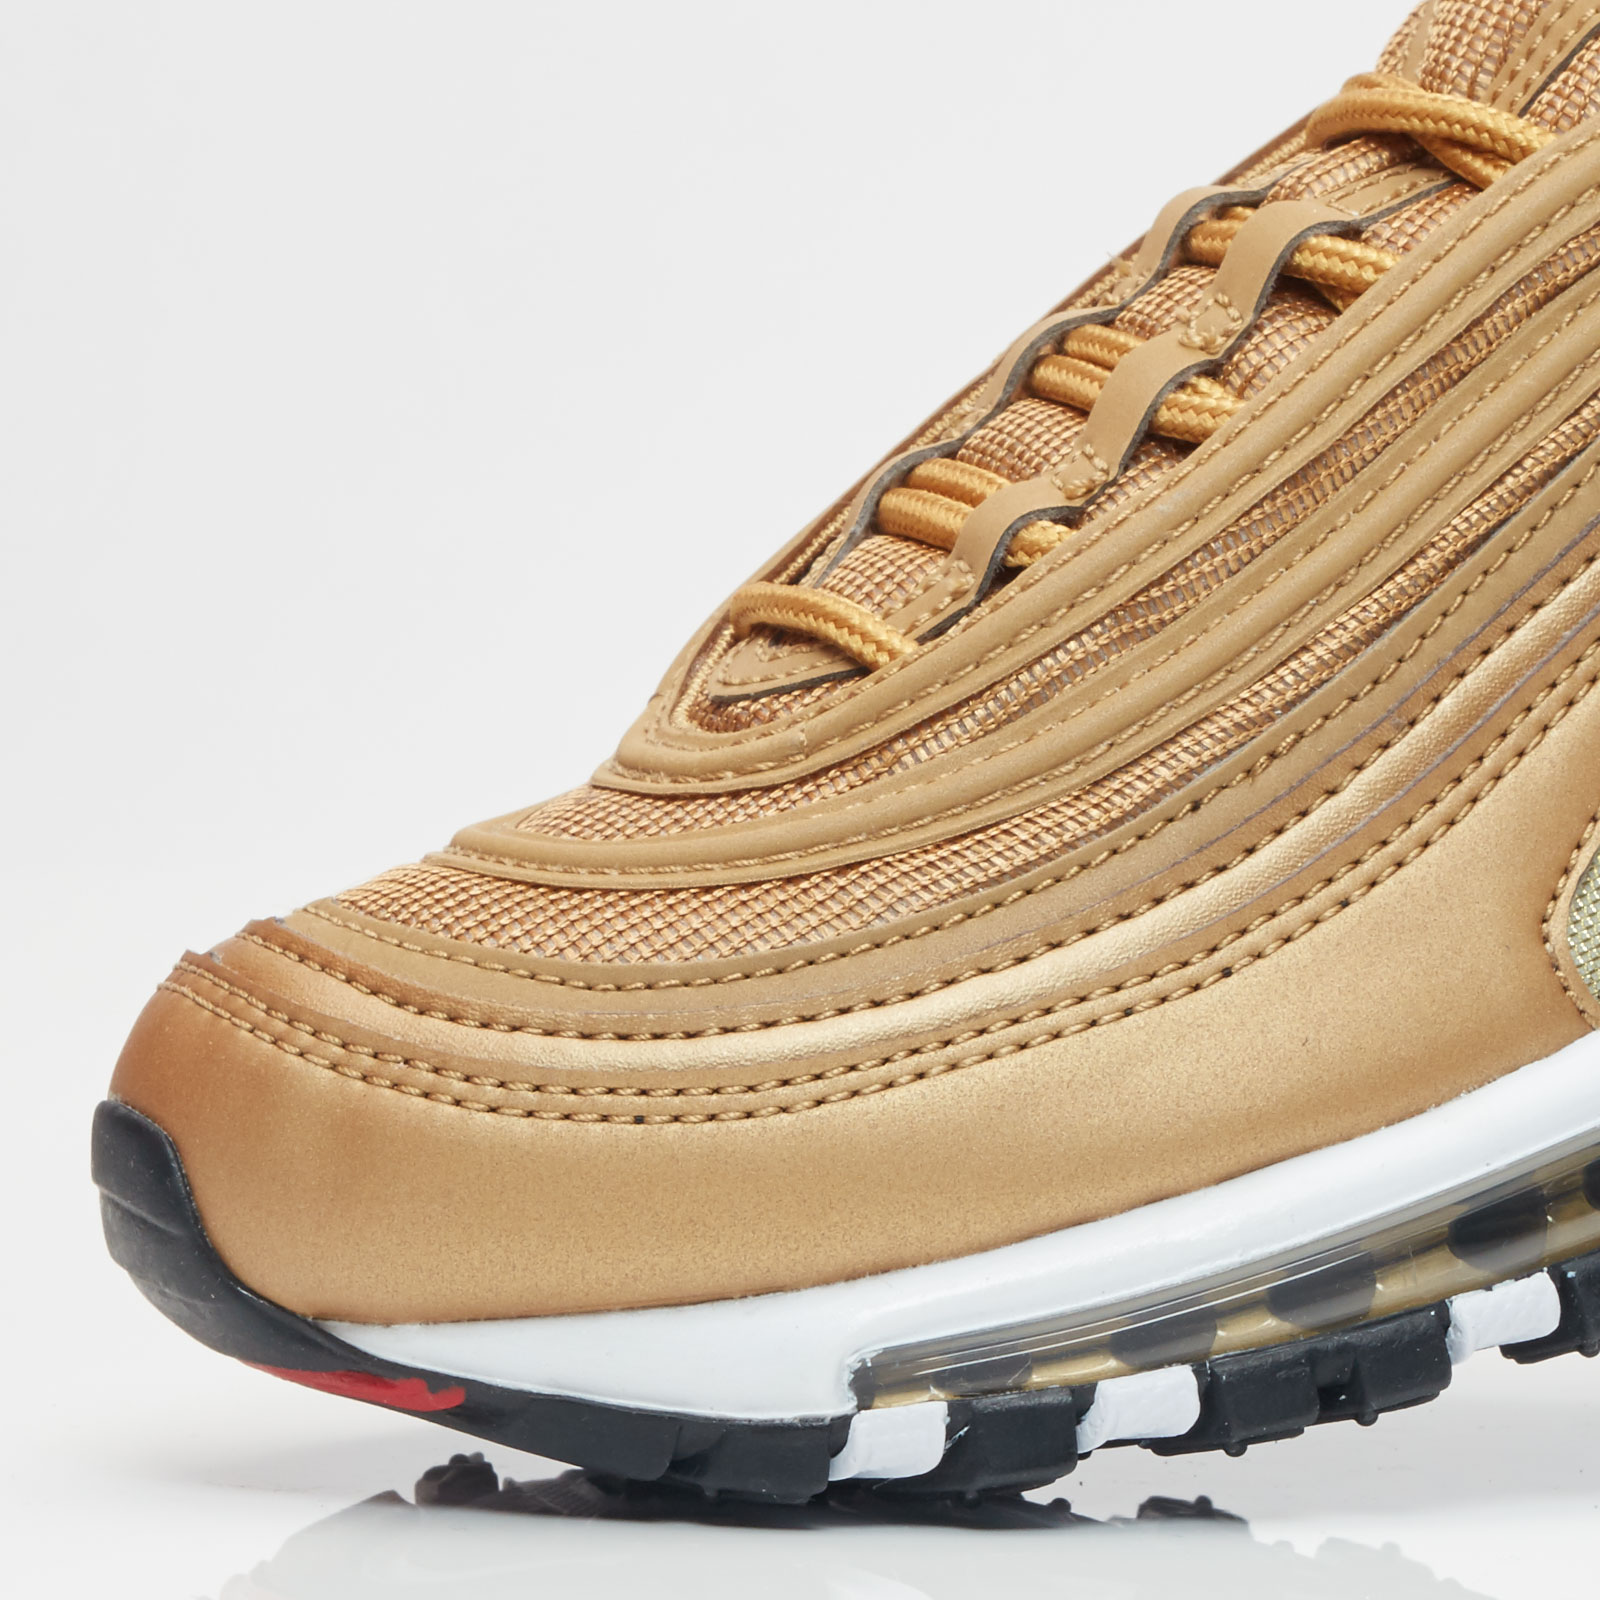 7a0e4df009 Nike Wmns Air Max 97 OG QS - 885691-700 - Sneakersnstuff | sneakers ...